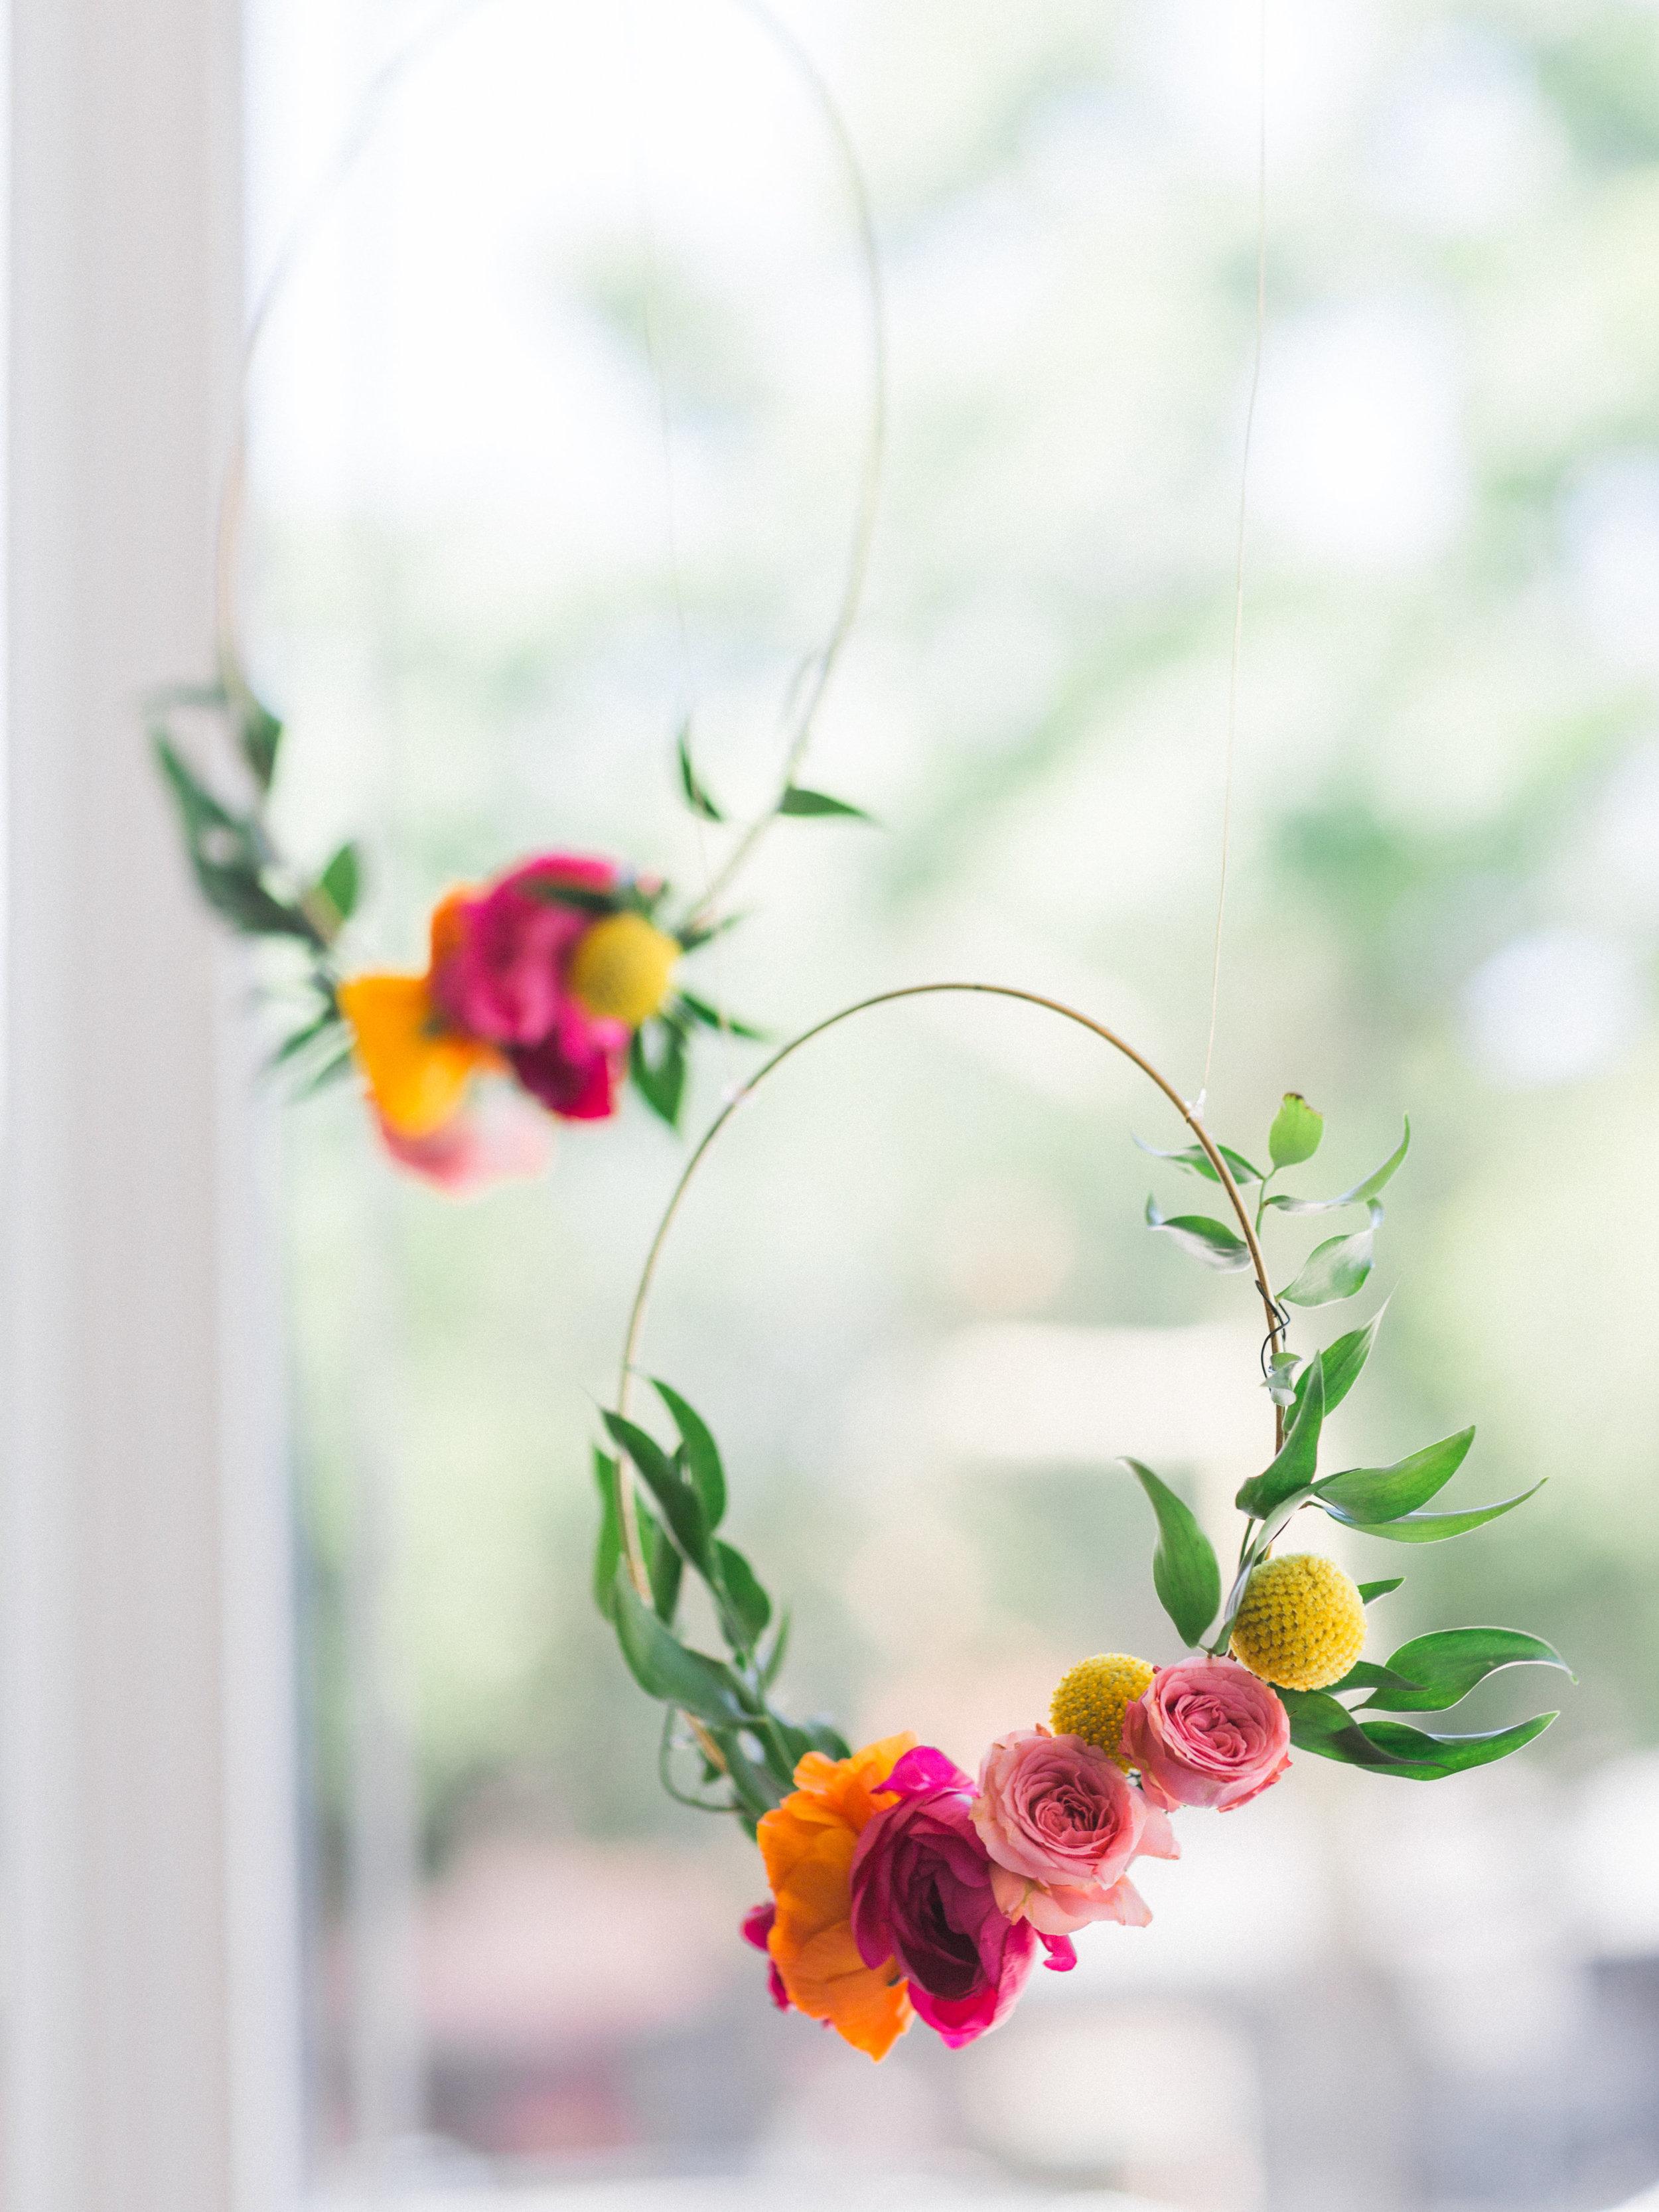 Bright_Cirtus_Florals_Sibyl_Sophia_Hanging_Florals.jpg